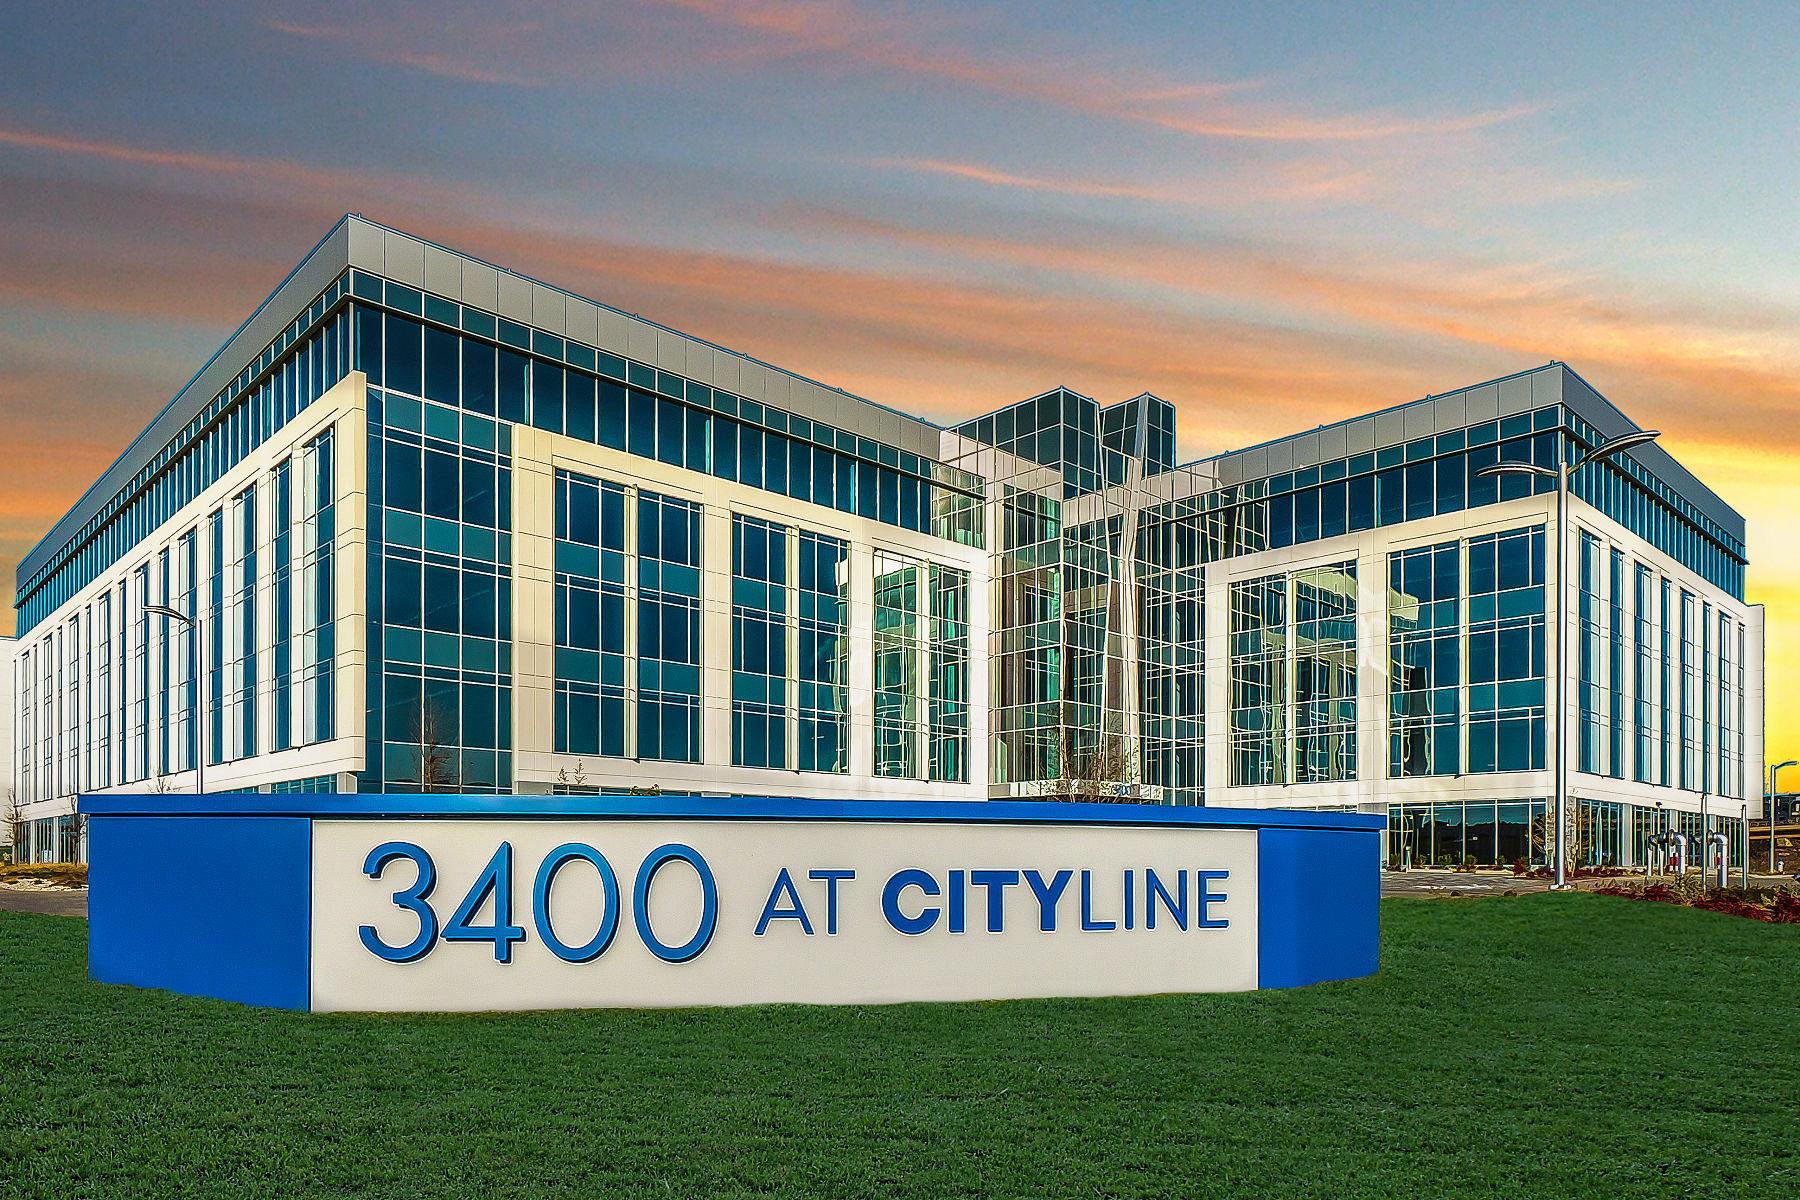 3400 City Line, Image Video Tours, Richardson Texas, Commercial Real Estate.jpg